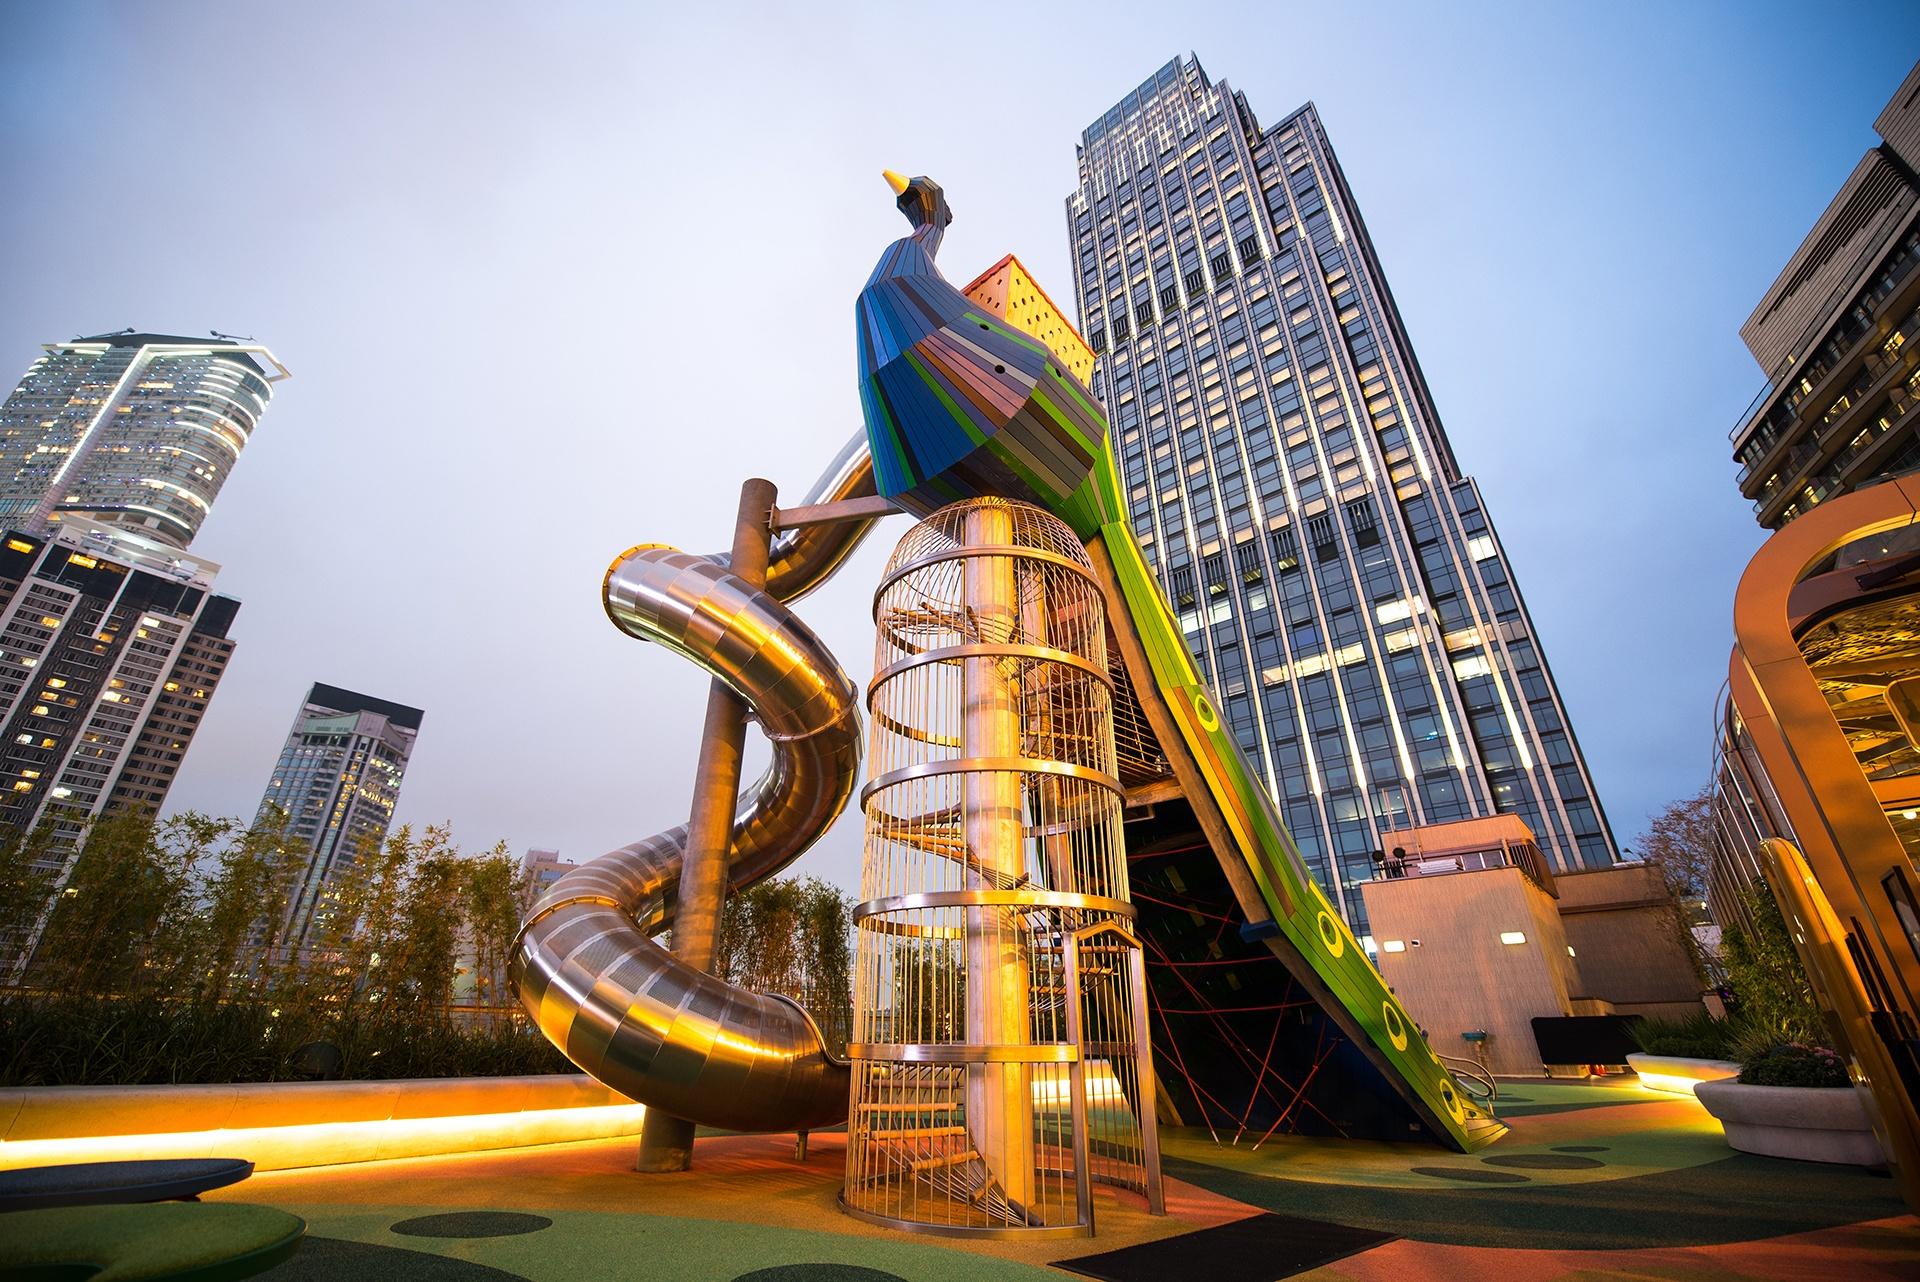 3_Peacock_K11 Musea_MONSTRUM_fantastic_playgrounds